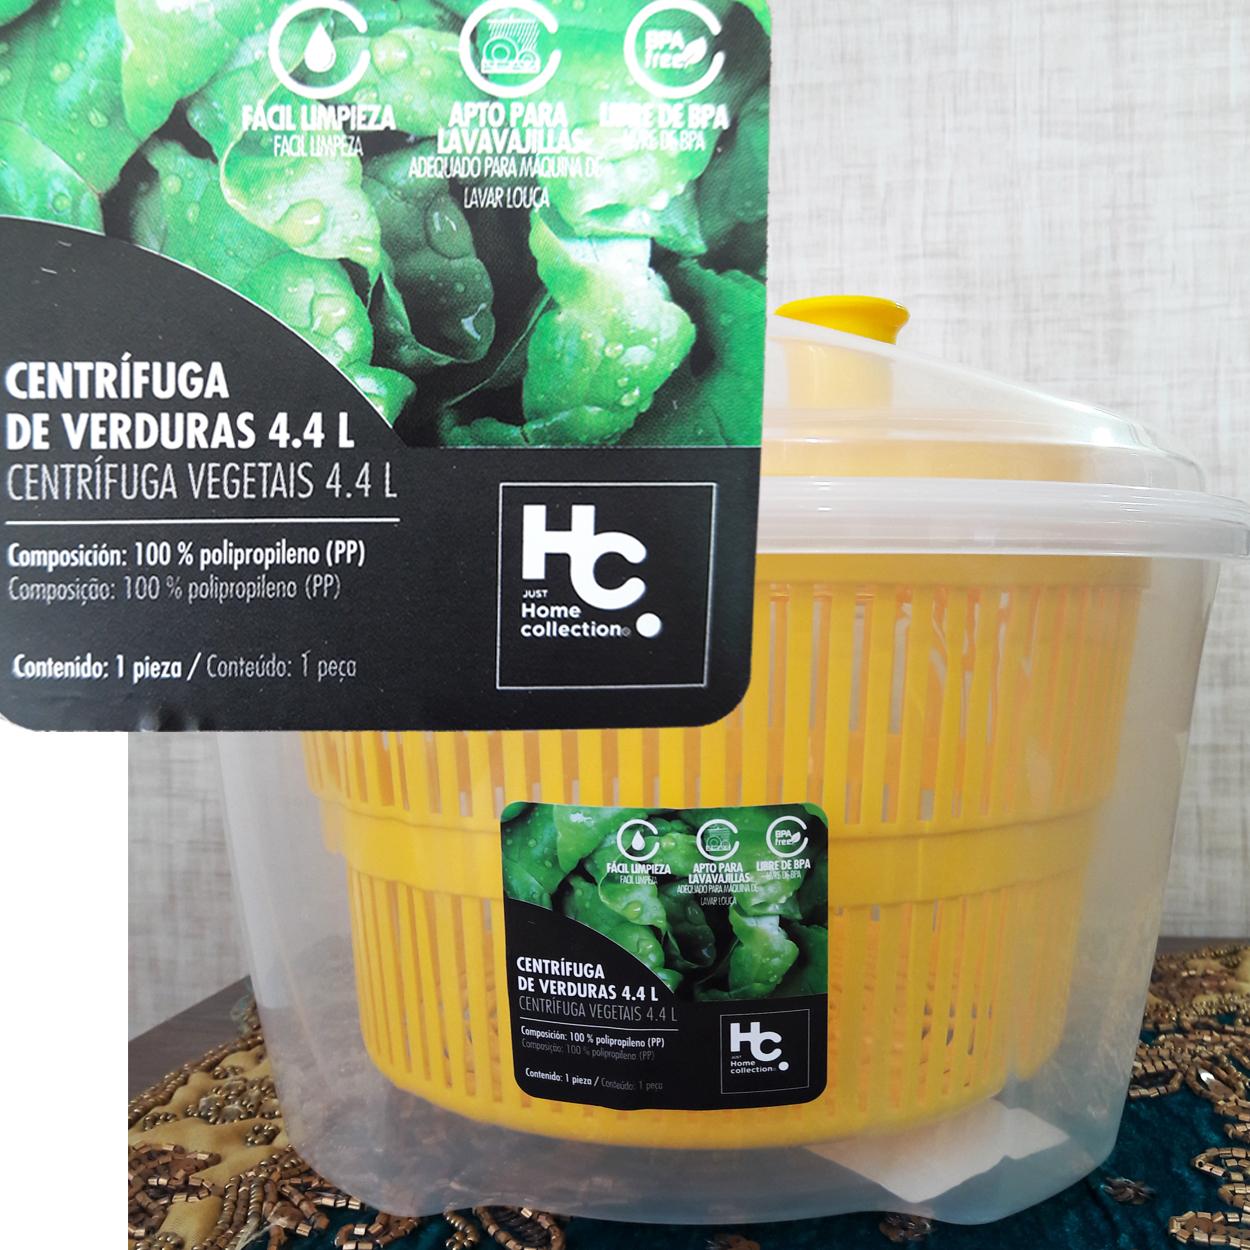 سبزی خشک کن هوم کالکشن مدل Verduras